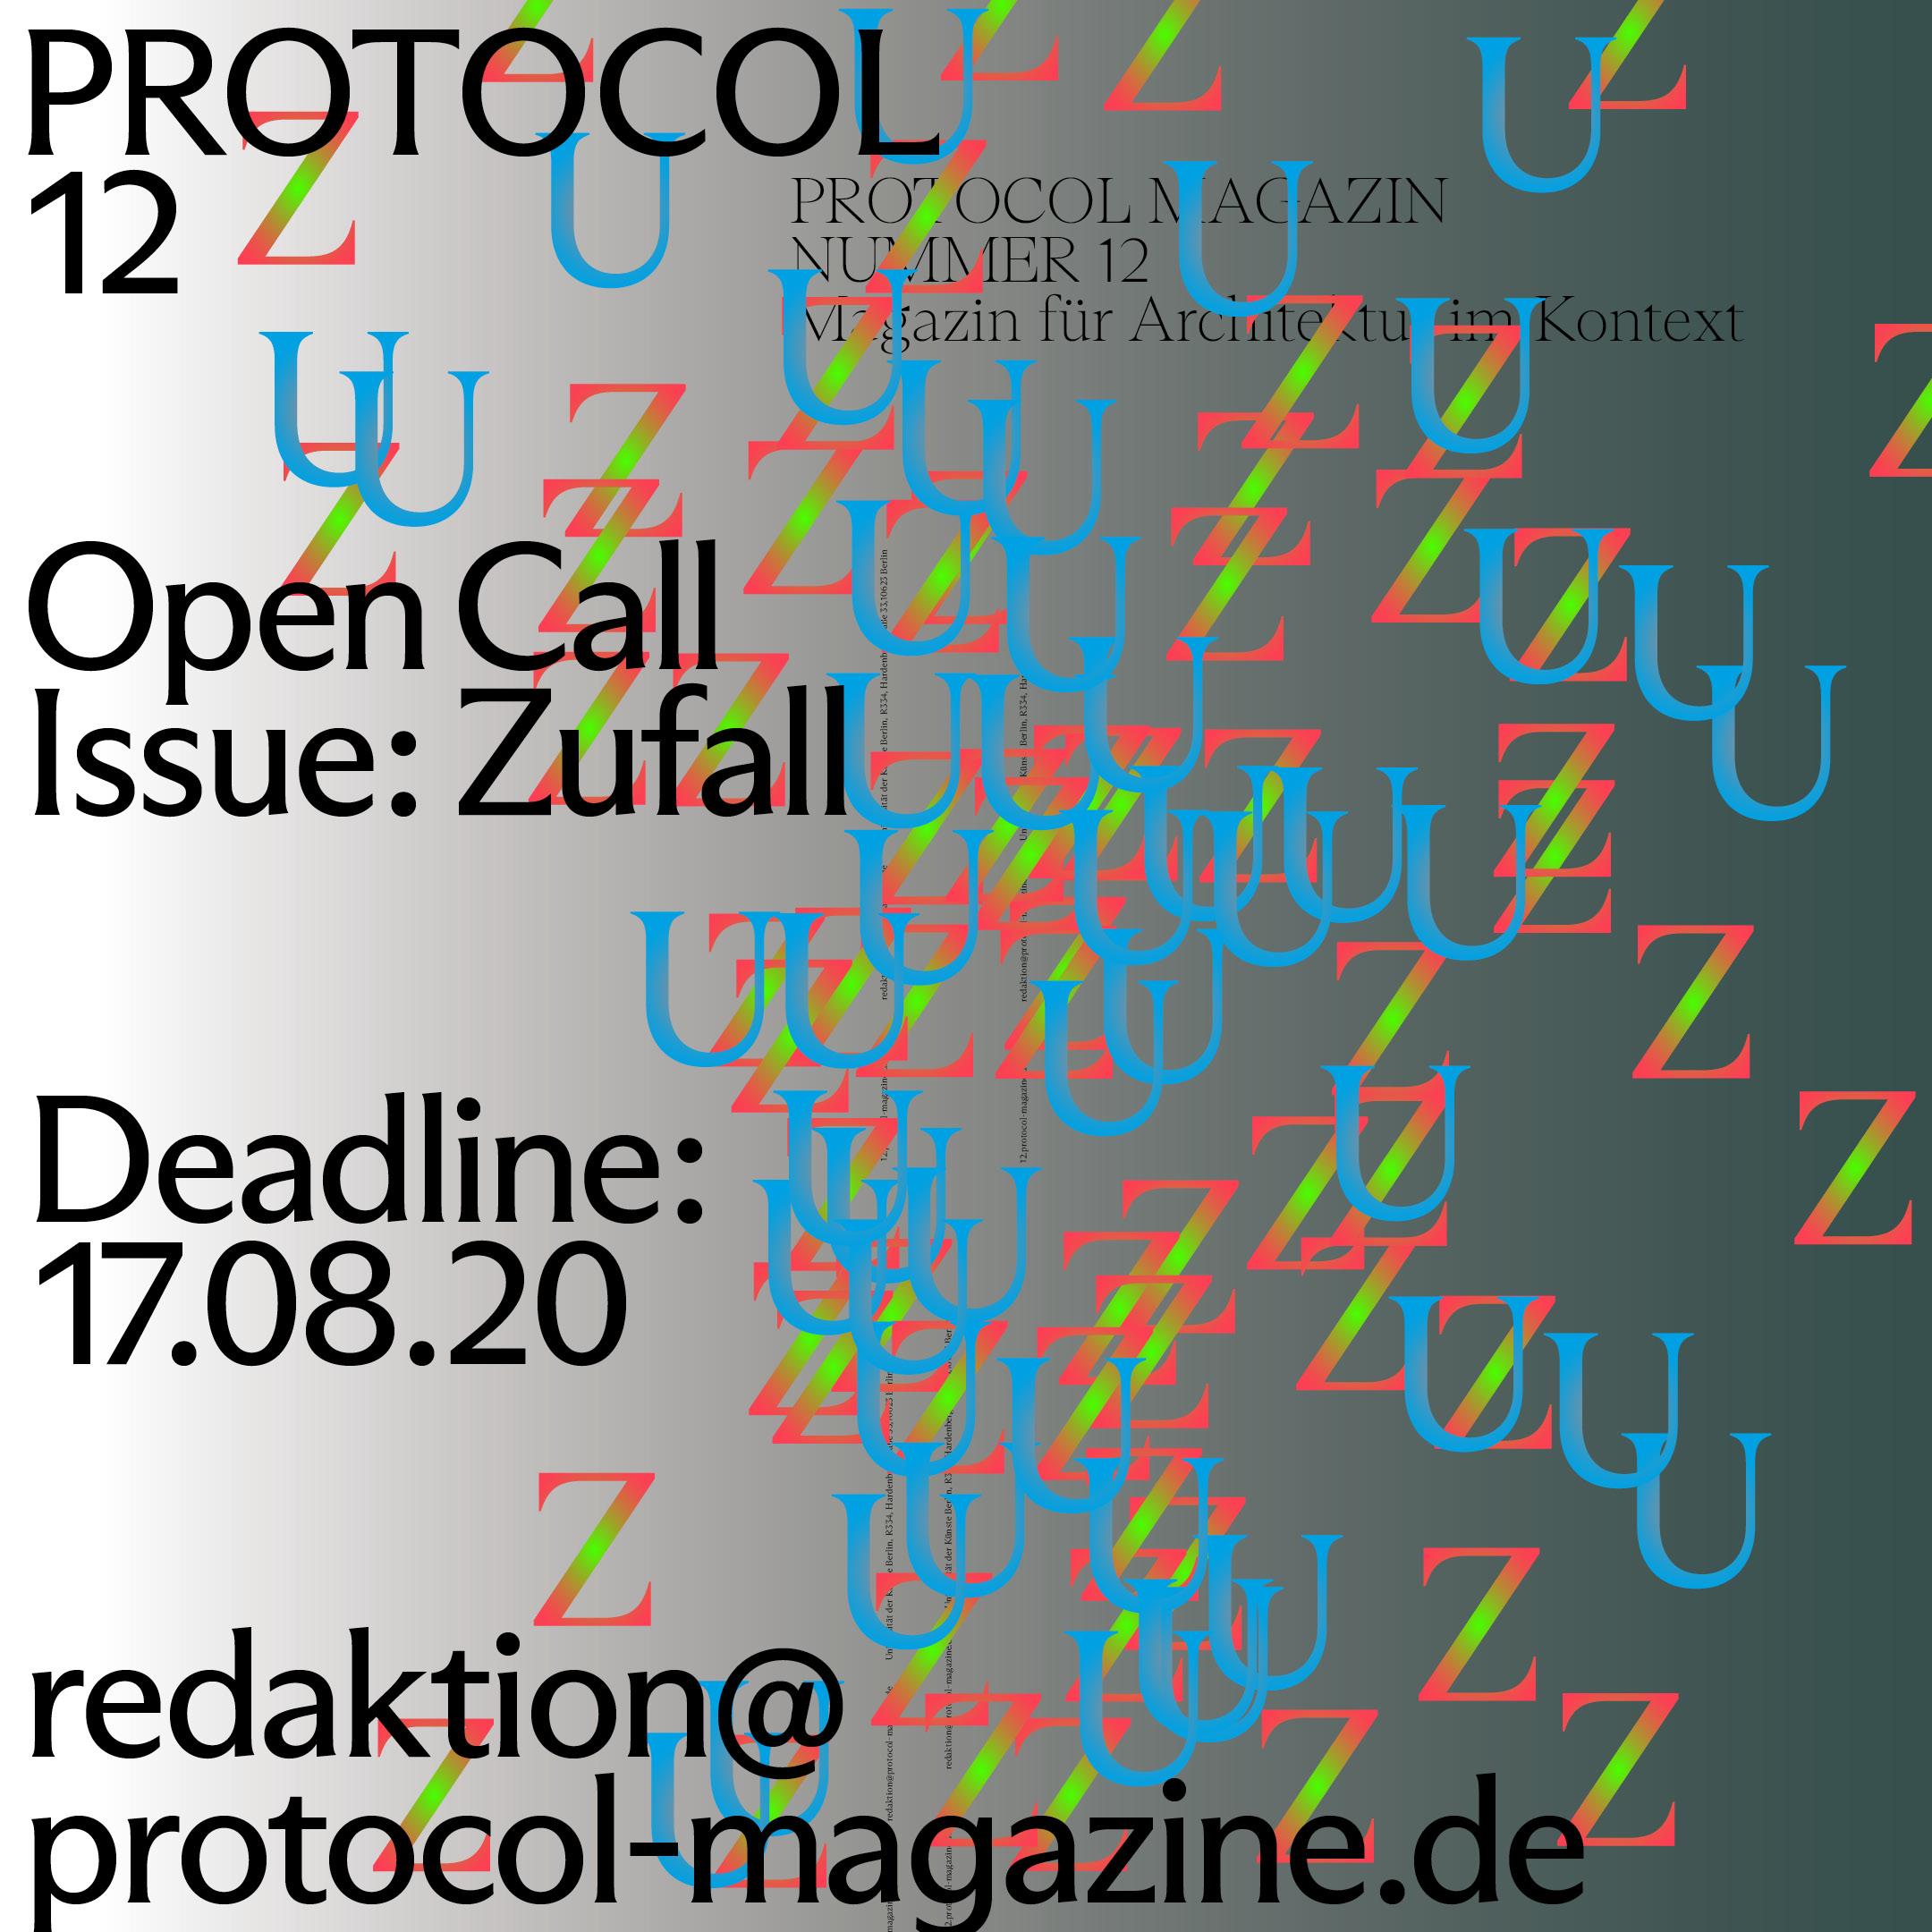 p12_Instagram-Redaktion_Protocol-Magazin_Magazin-fuer-Architektur-im-Kontext7